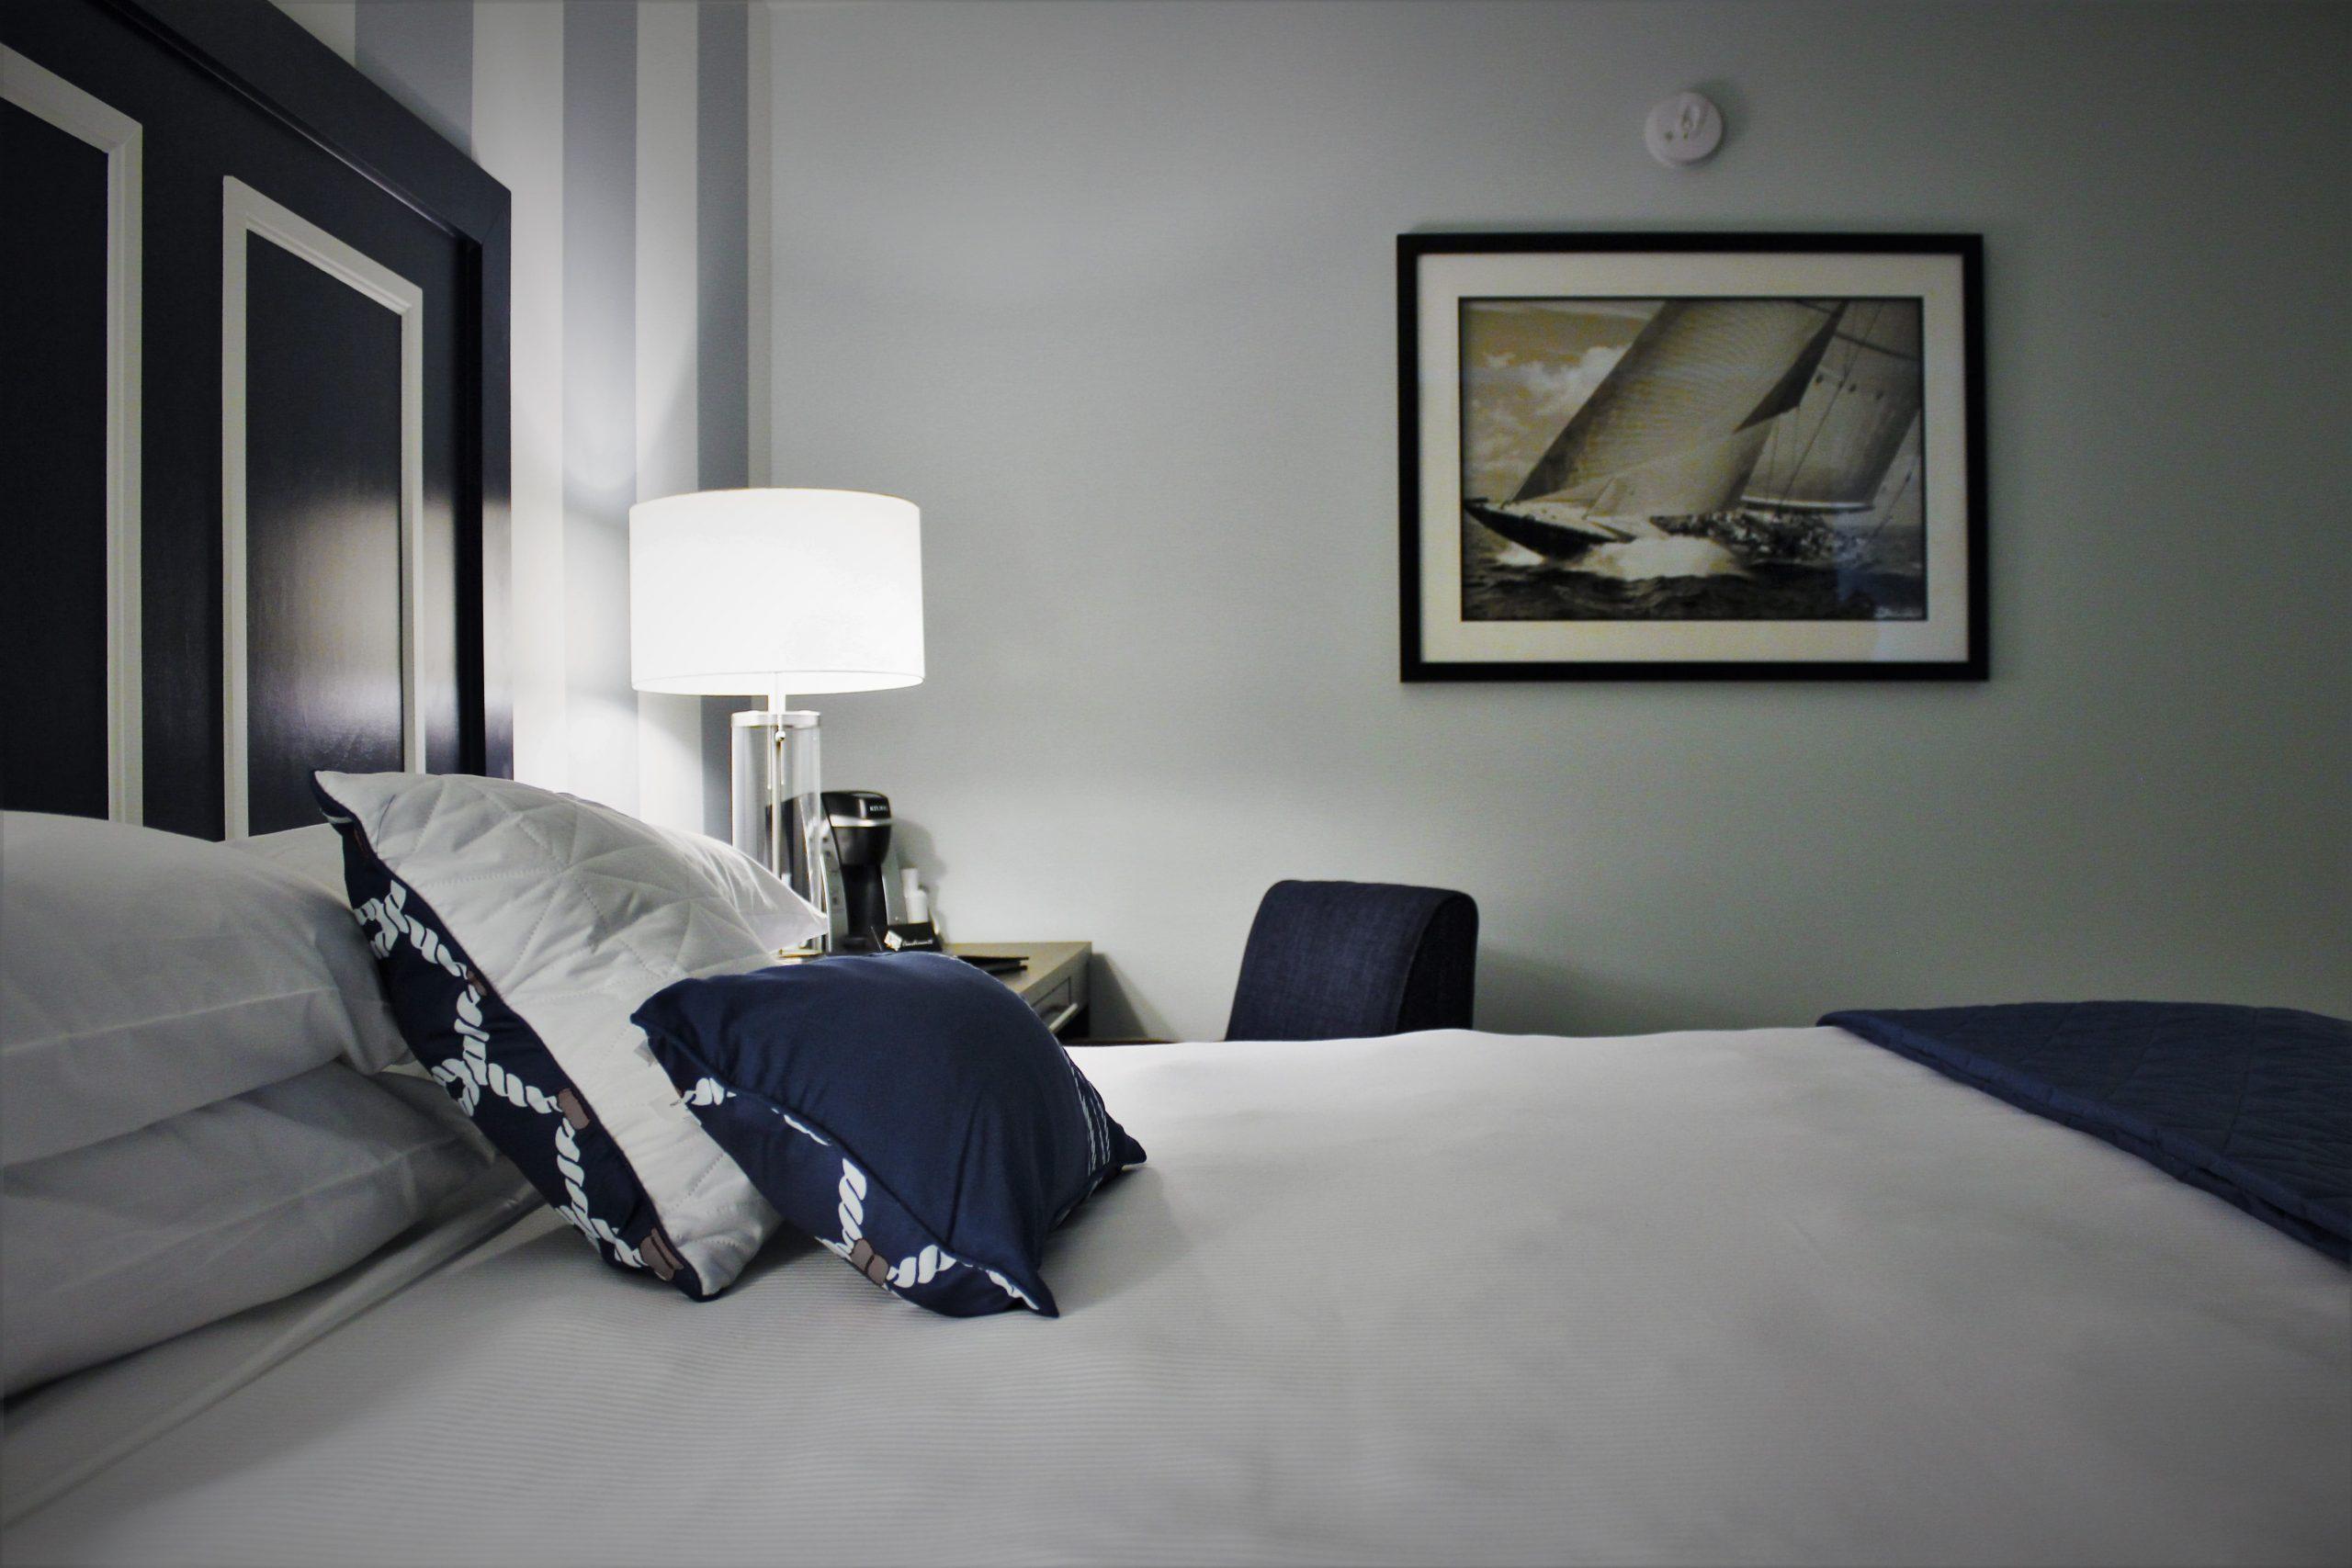 Bed closeup left - Virginia whetstone